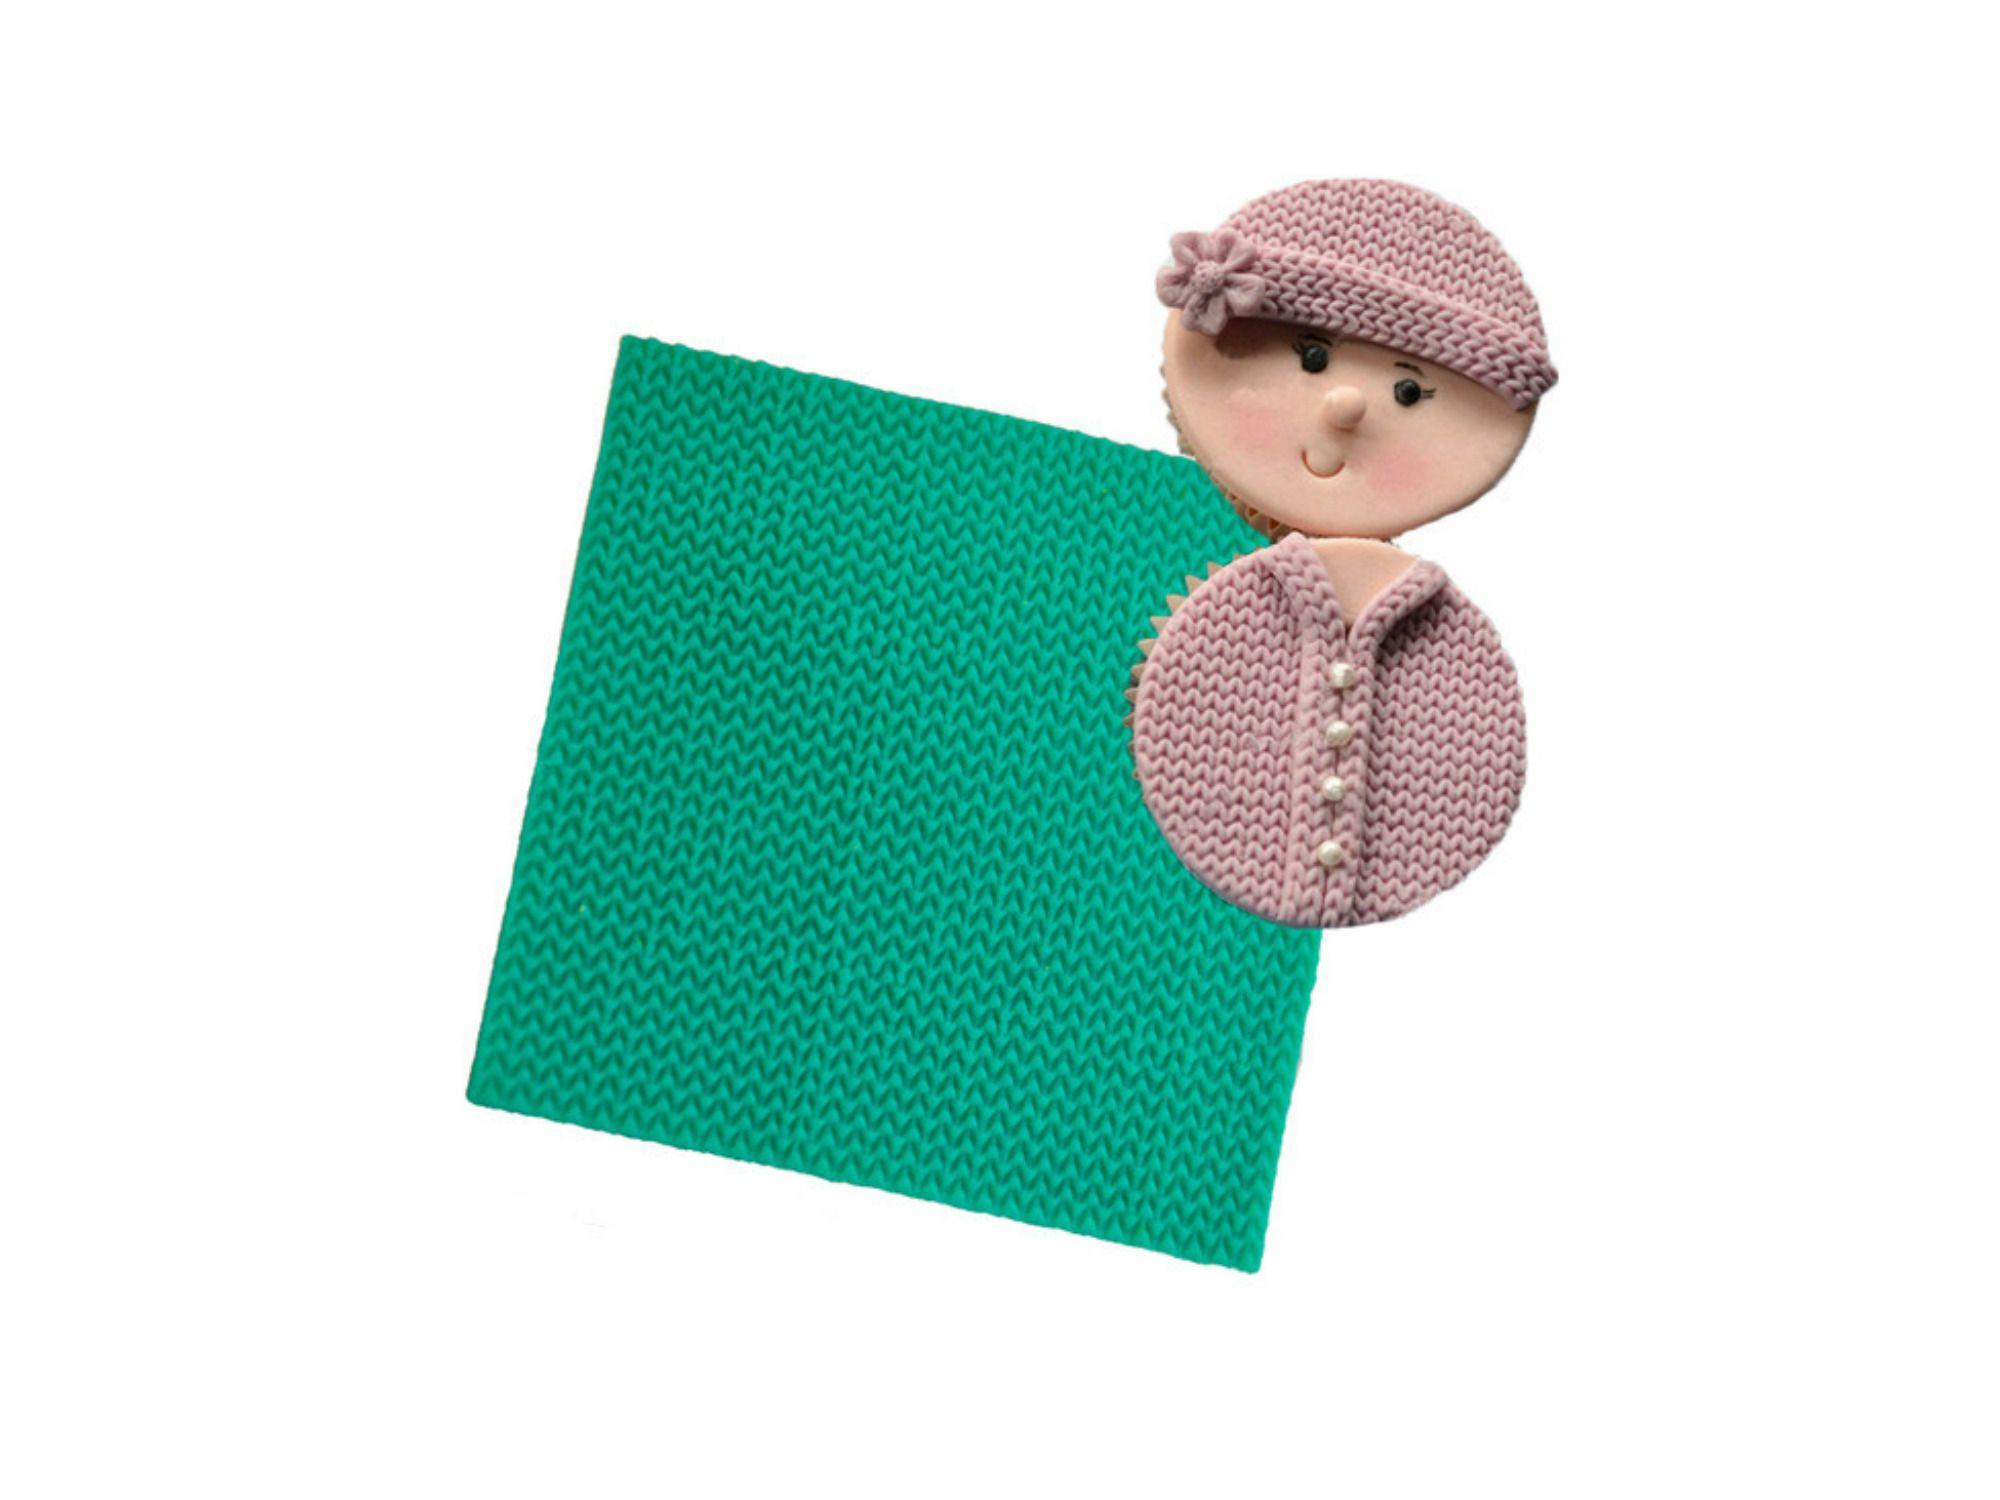 Sweater Knit Pattern Embosser Silicone Mat #sweaterknitsiliconemat #siliconemold #bakingsupplies #knitsiliconemat http://www.itacakes.com/product/sweater-knit-pattern-embosser-silicone-mat/